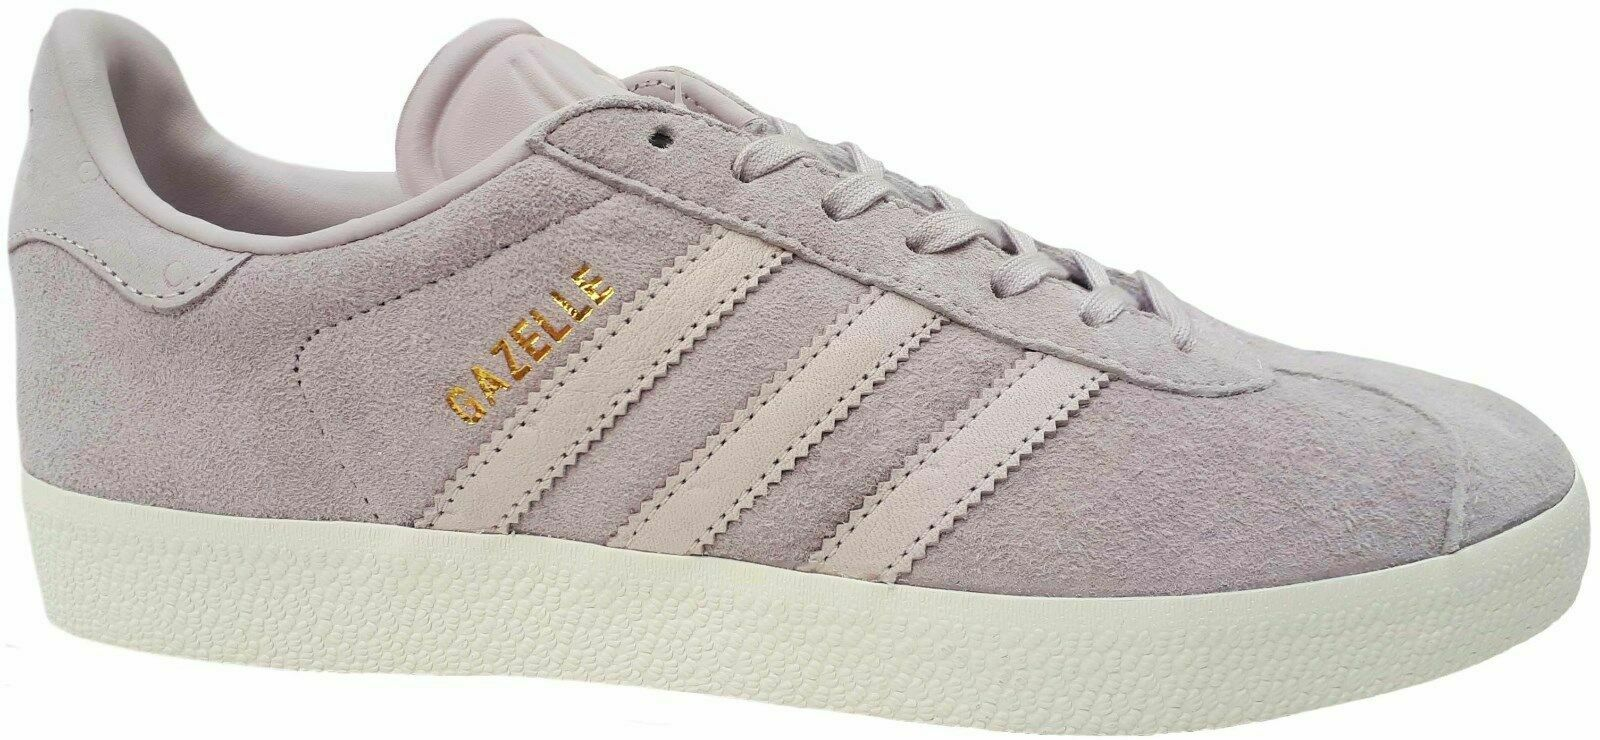 Adidas Gazelle W Neu Damen Turnschuhe Schuhe Training Original BY8871 Gr 36 2 3